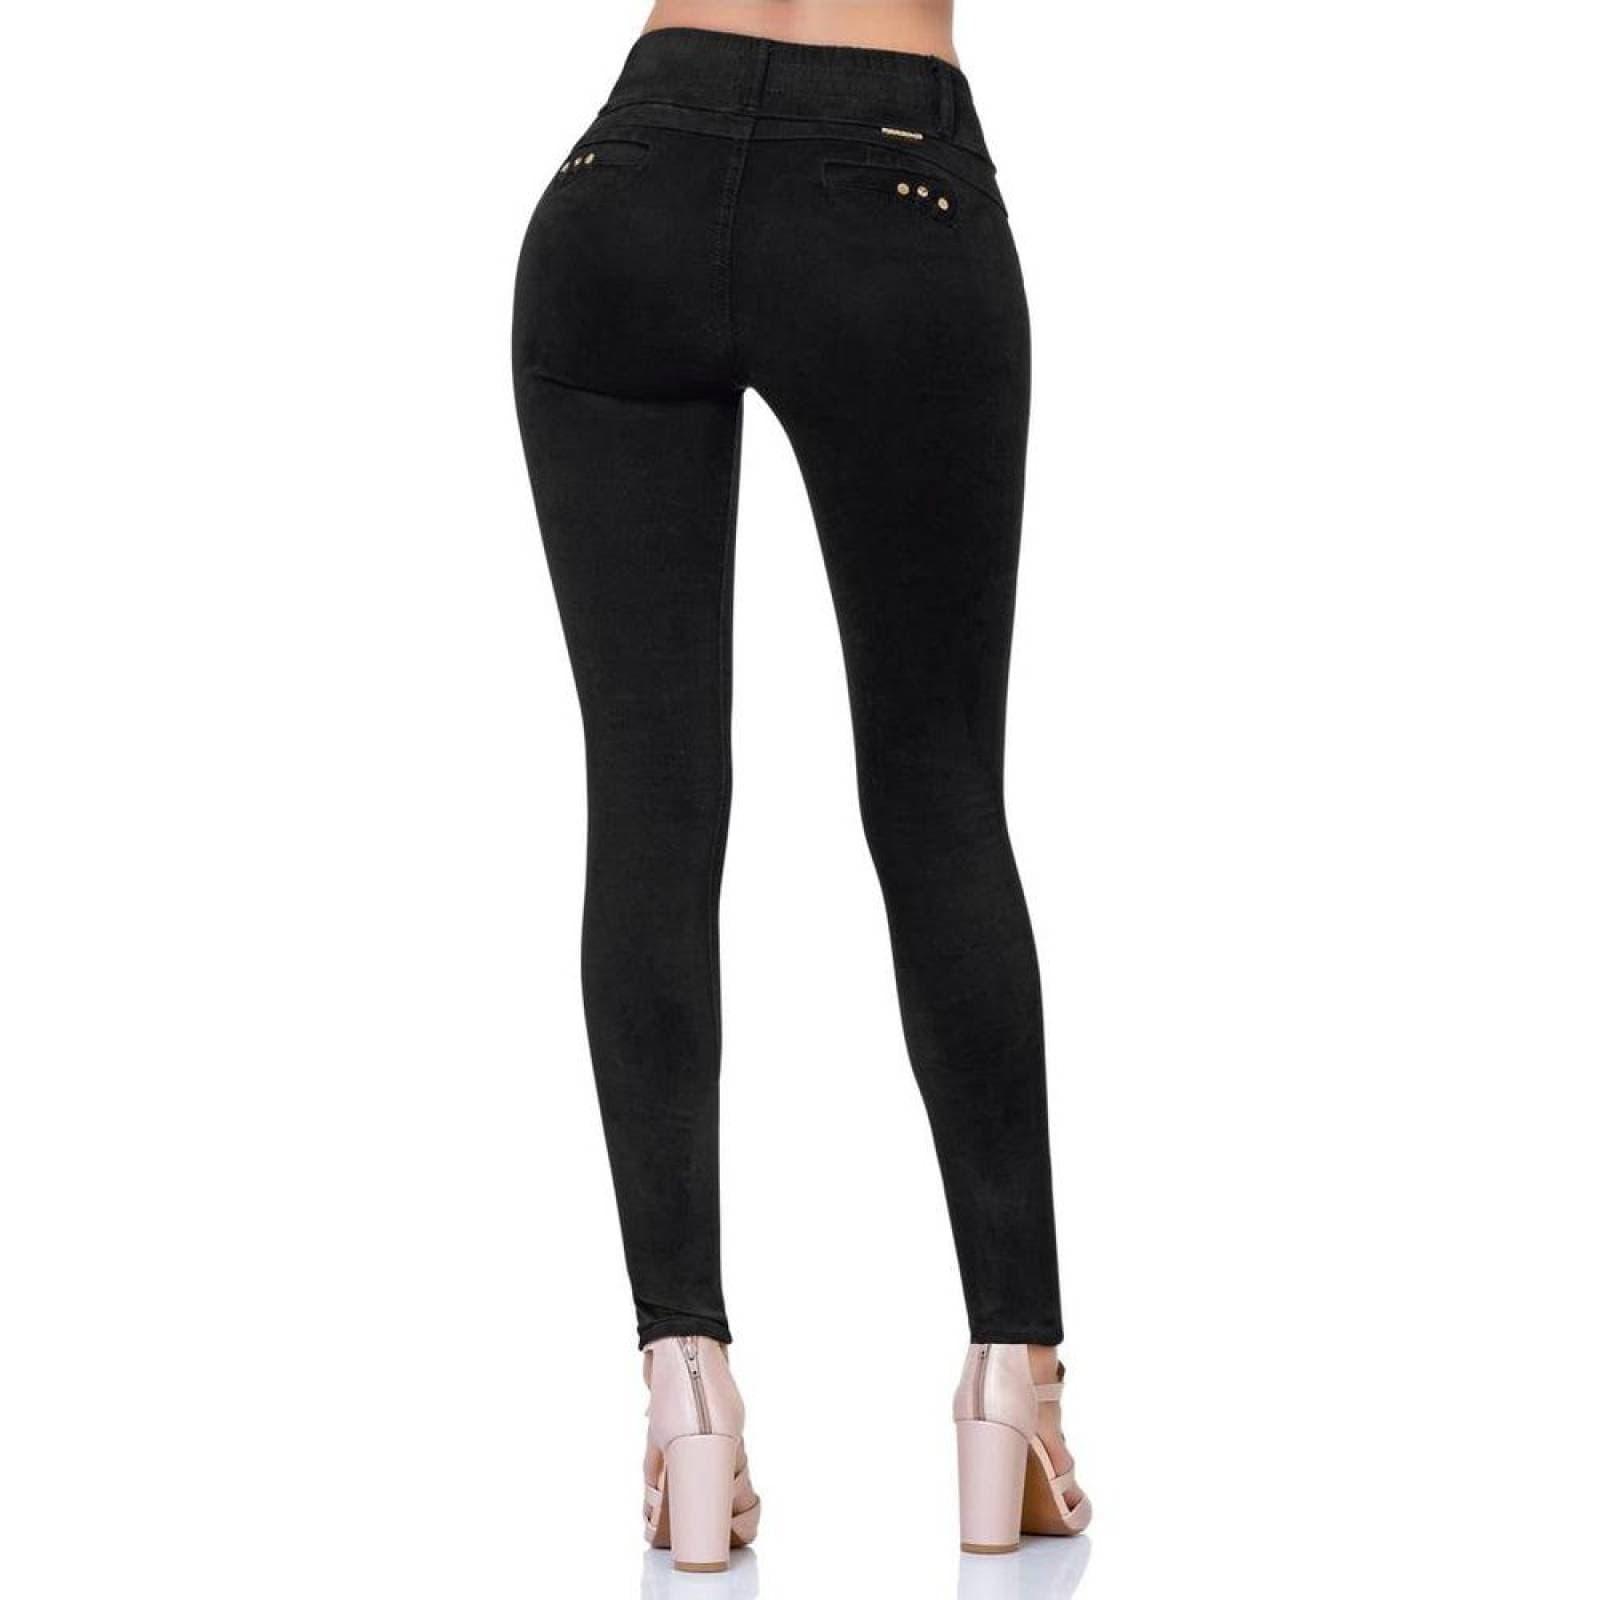 Pantalon Casual Mujer Fergino Negro 52900355 Gabardina Stretch